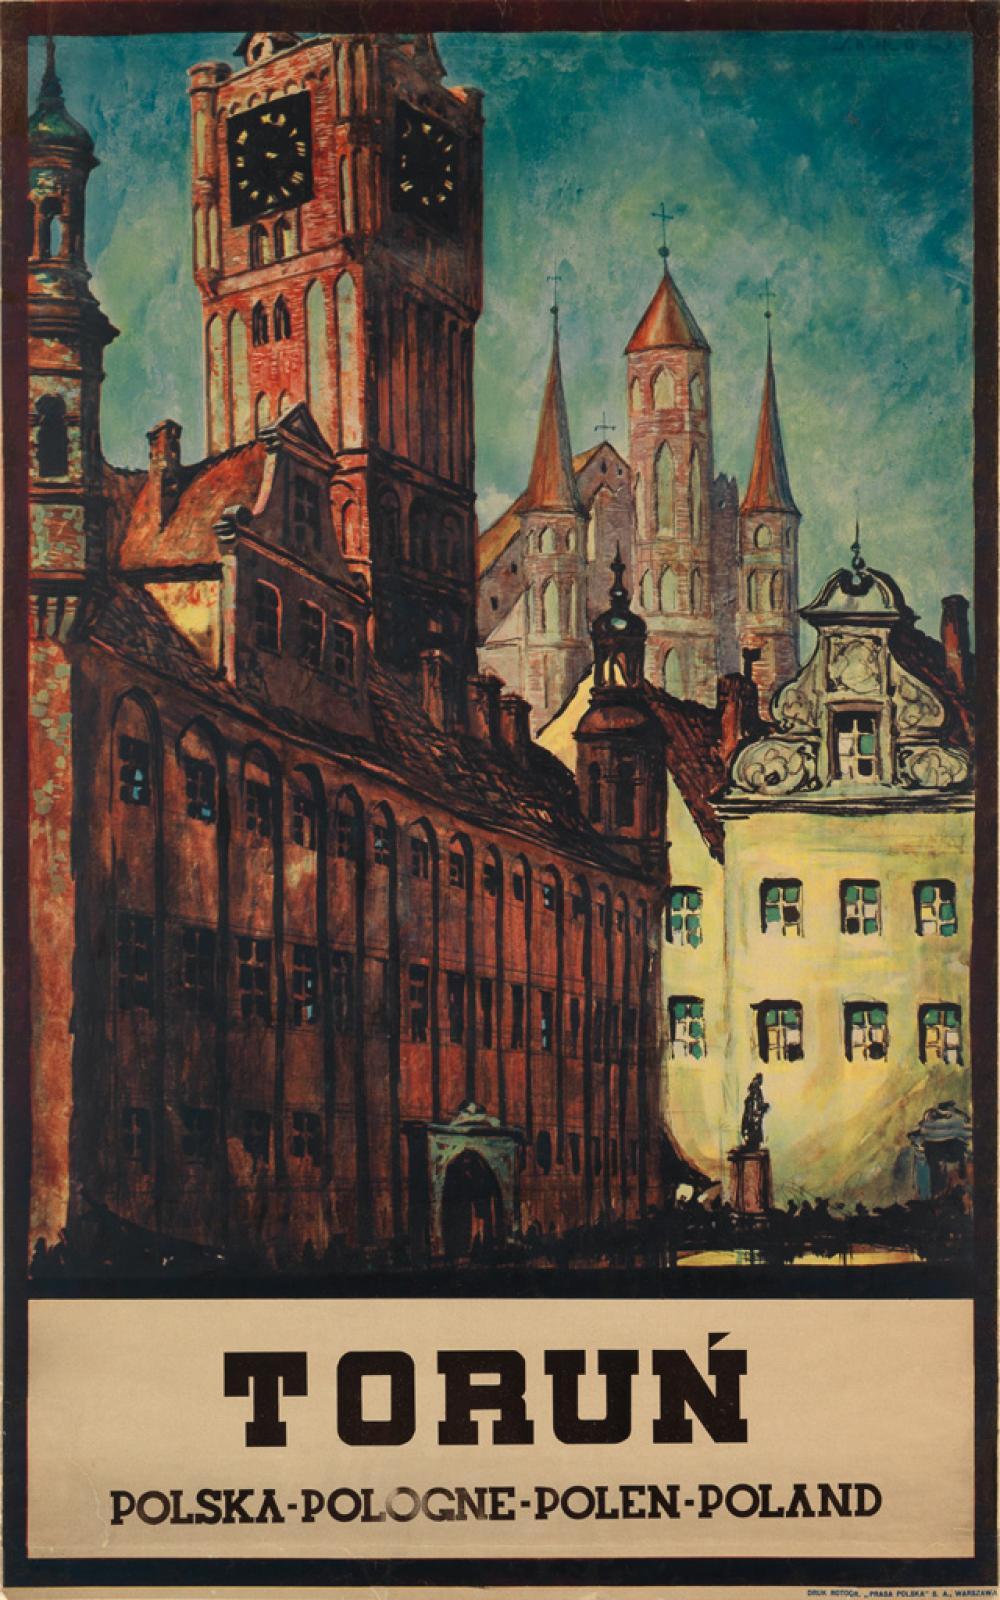 STEFAN NORBLIN (1892-1952). TORUN. Circa 1927. 39x24 inches, 99x62 cm. Bibljoteka Polska, Warsaw.